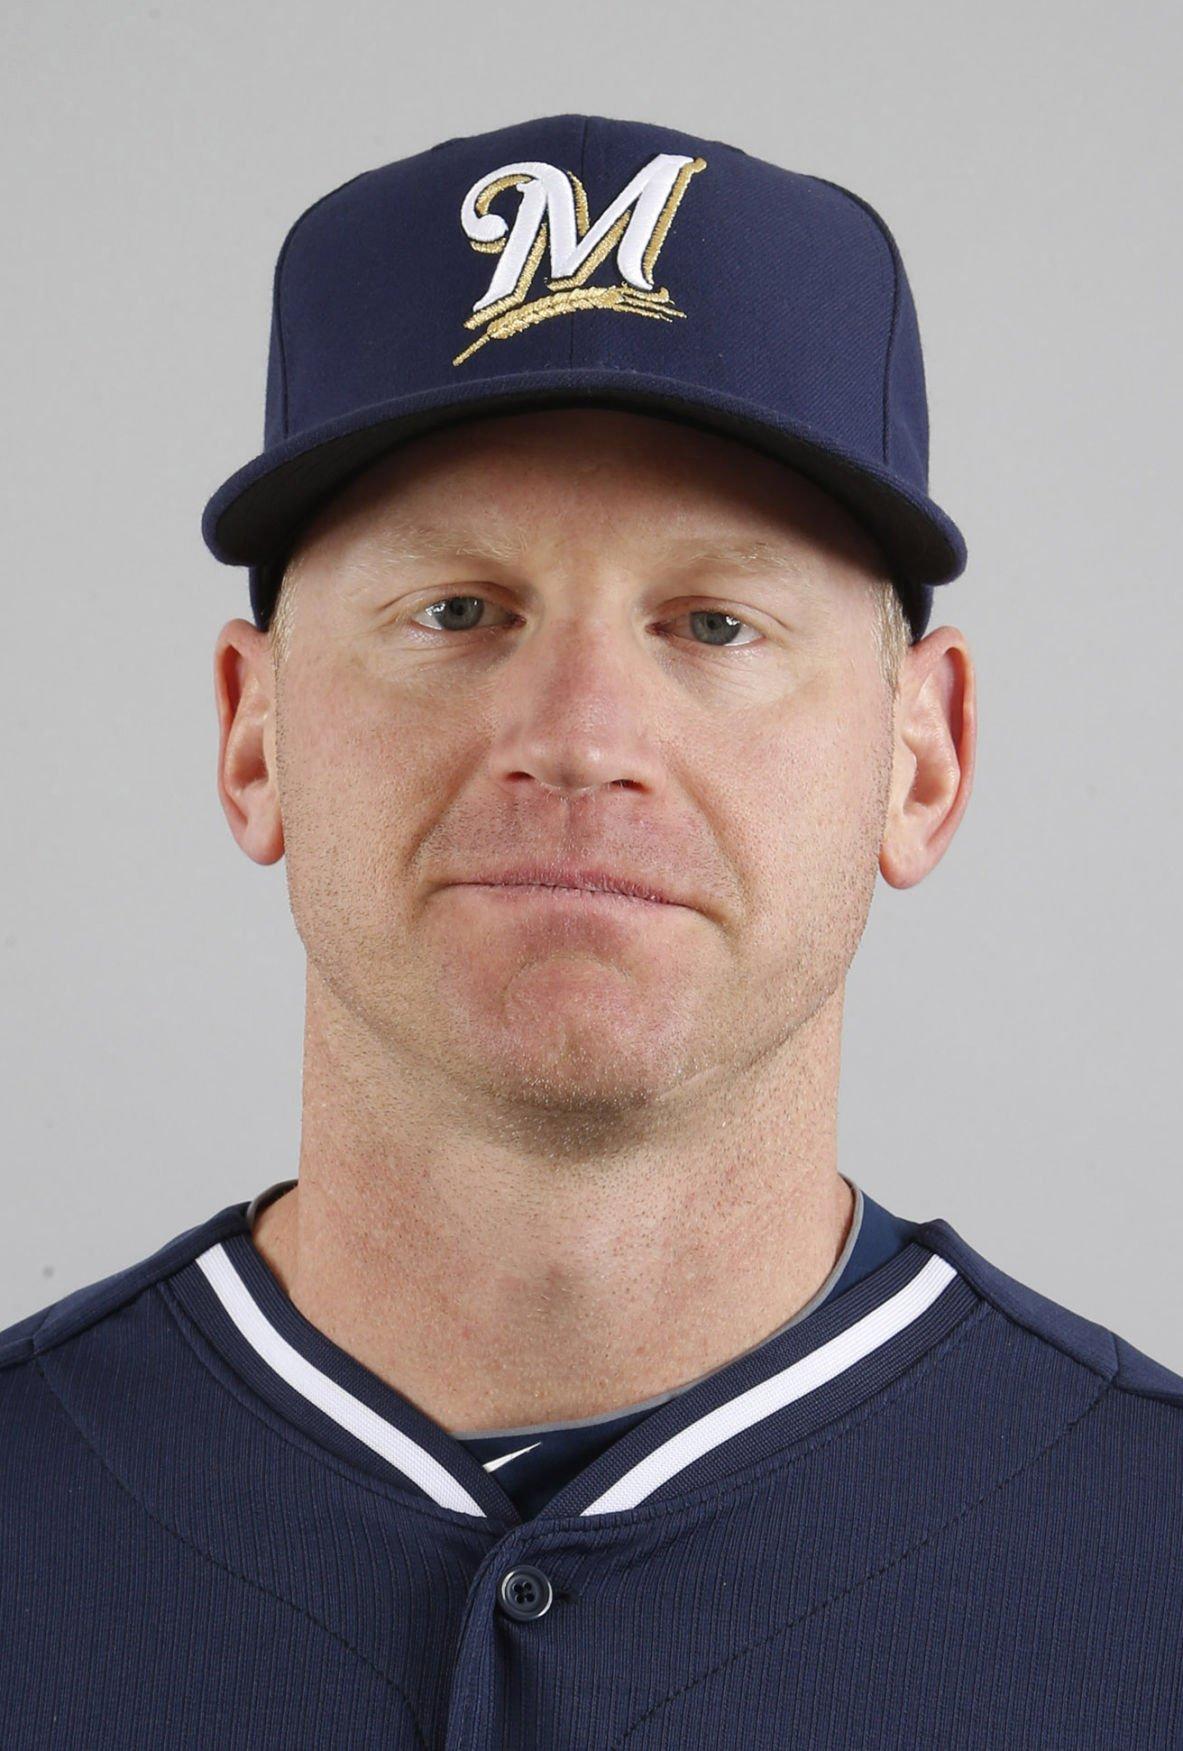 Hitters Baseball Home Page  HomeTeamsONLINE